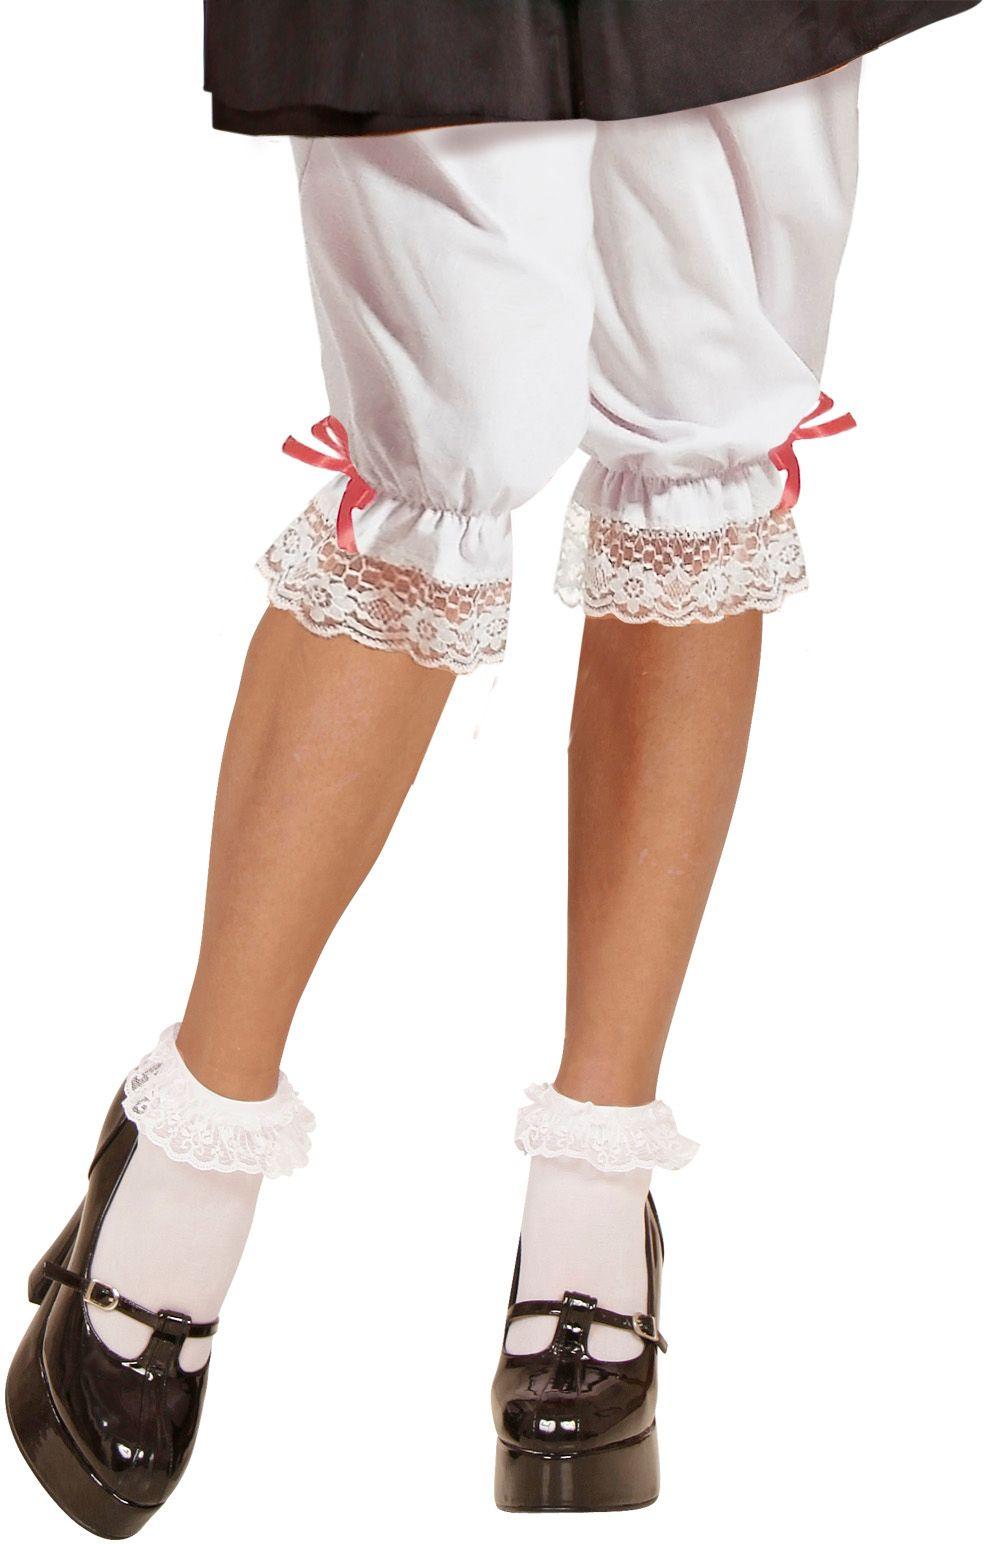 Witte broek met strikje oktoberfest